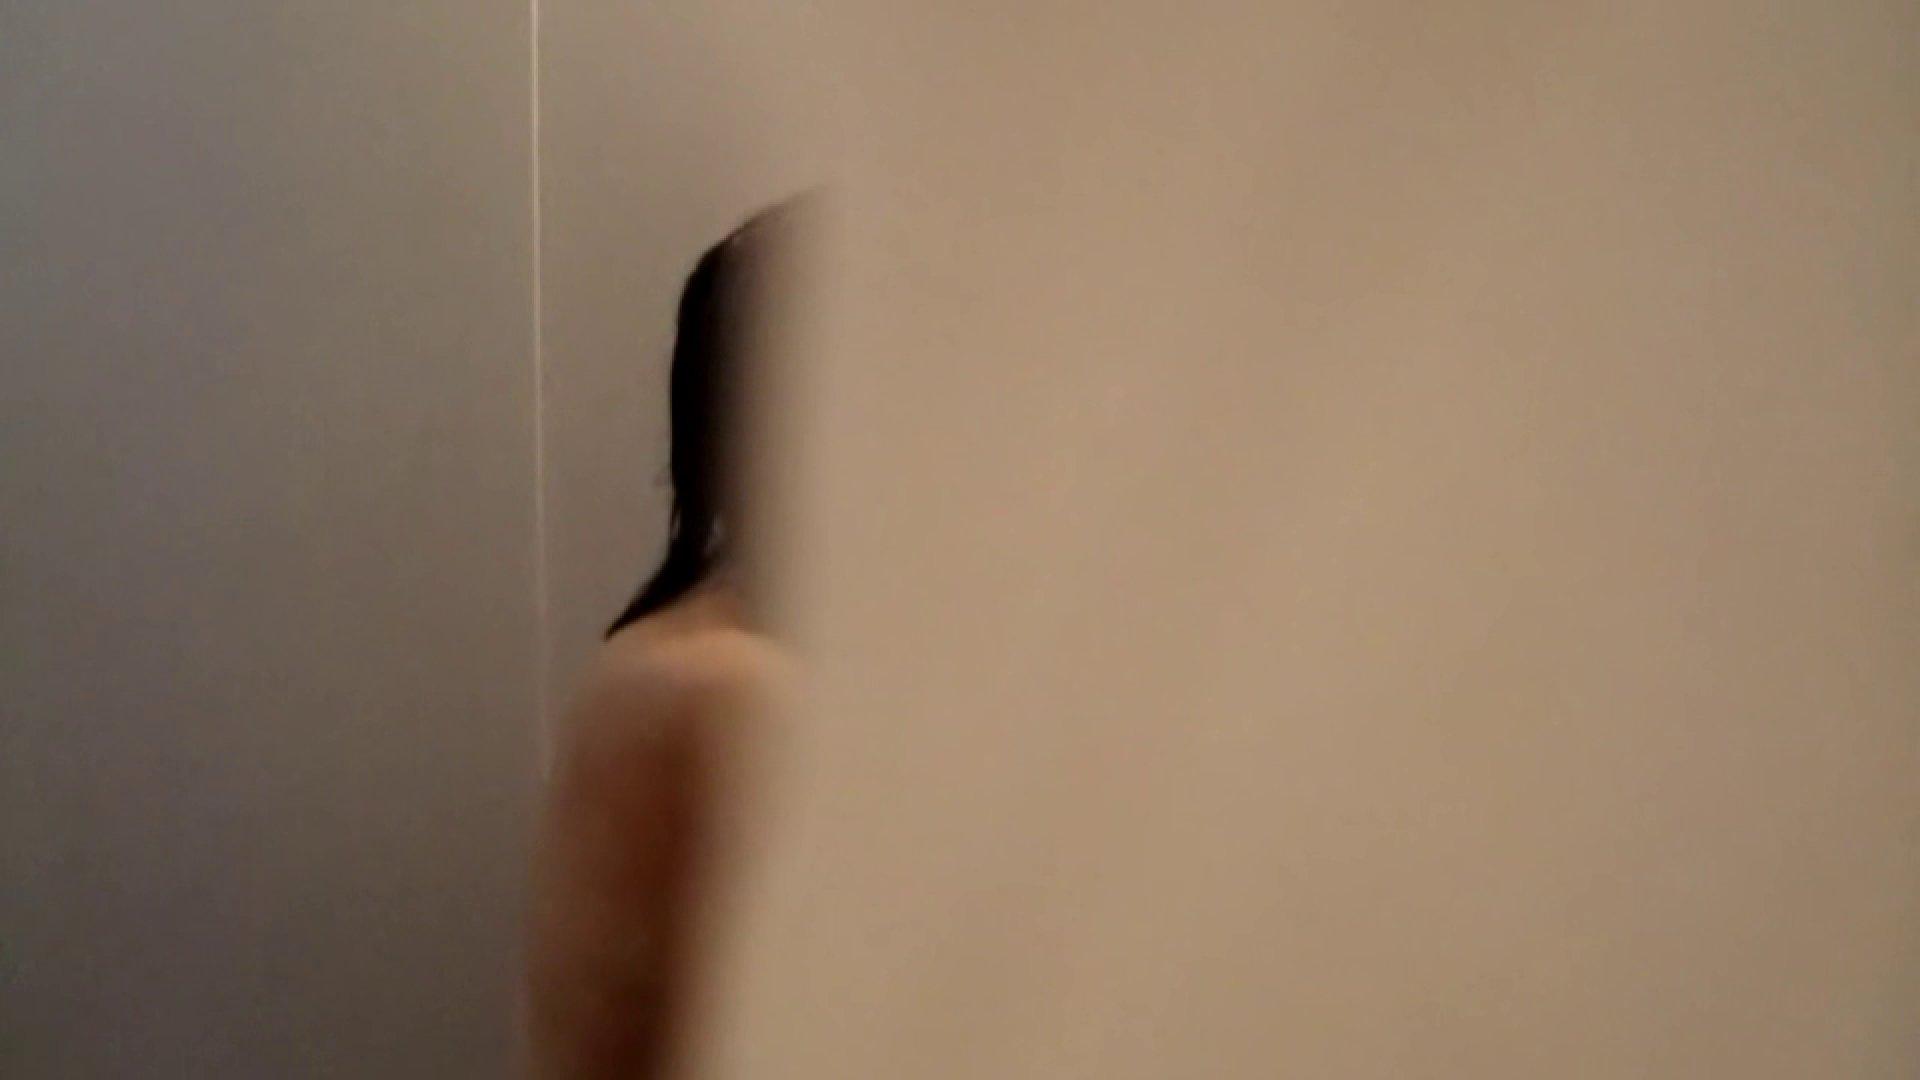 vol.2 葵のグラドル顔負けの爆乳を入浴シーンでどうぞ。 巨乳 ぱこり動画紹介 110枚 13